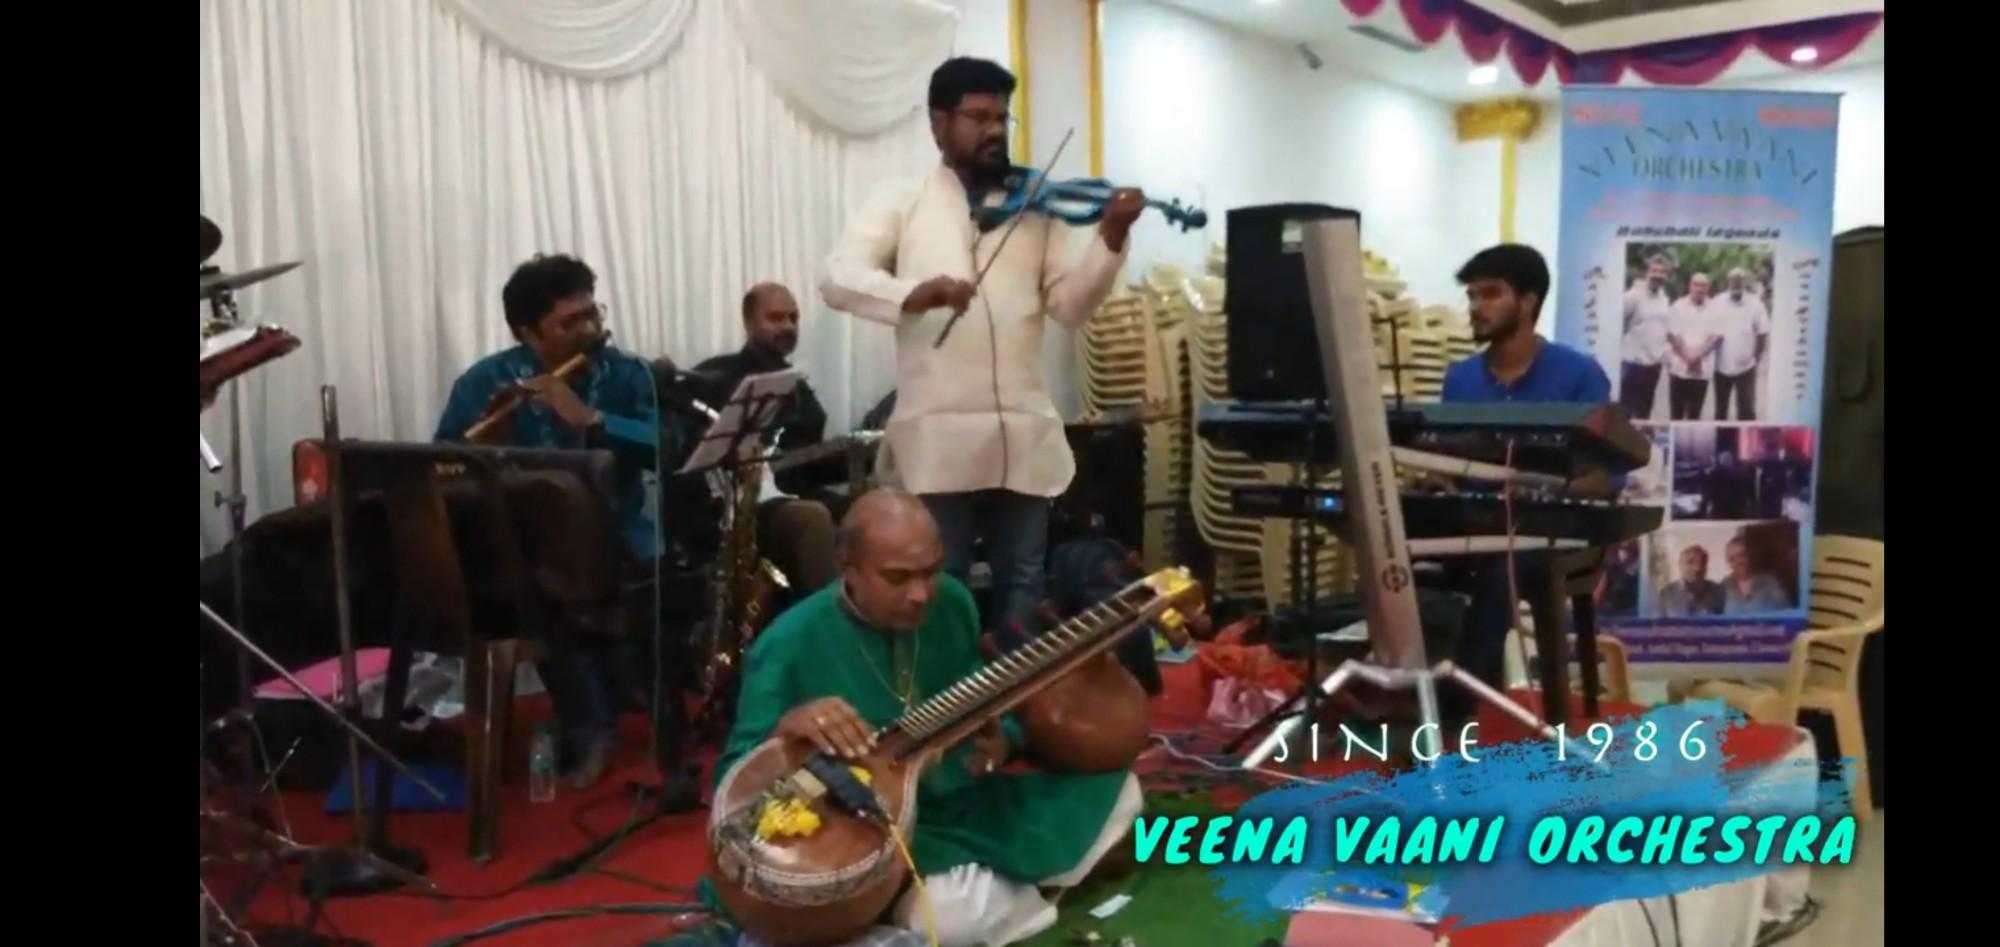 Veena Vani Orchestra in Ramapuram, Chennai-600089 | Sulekha